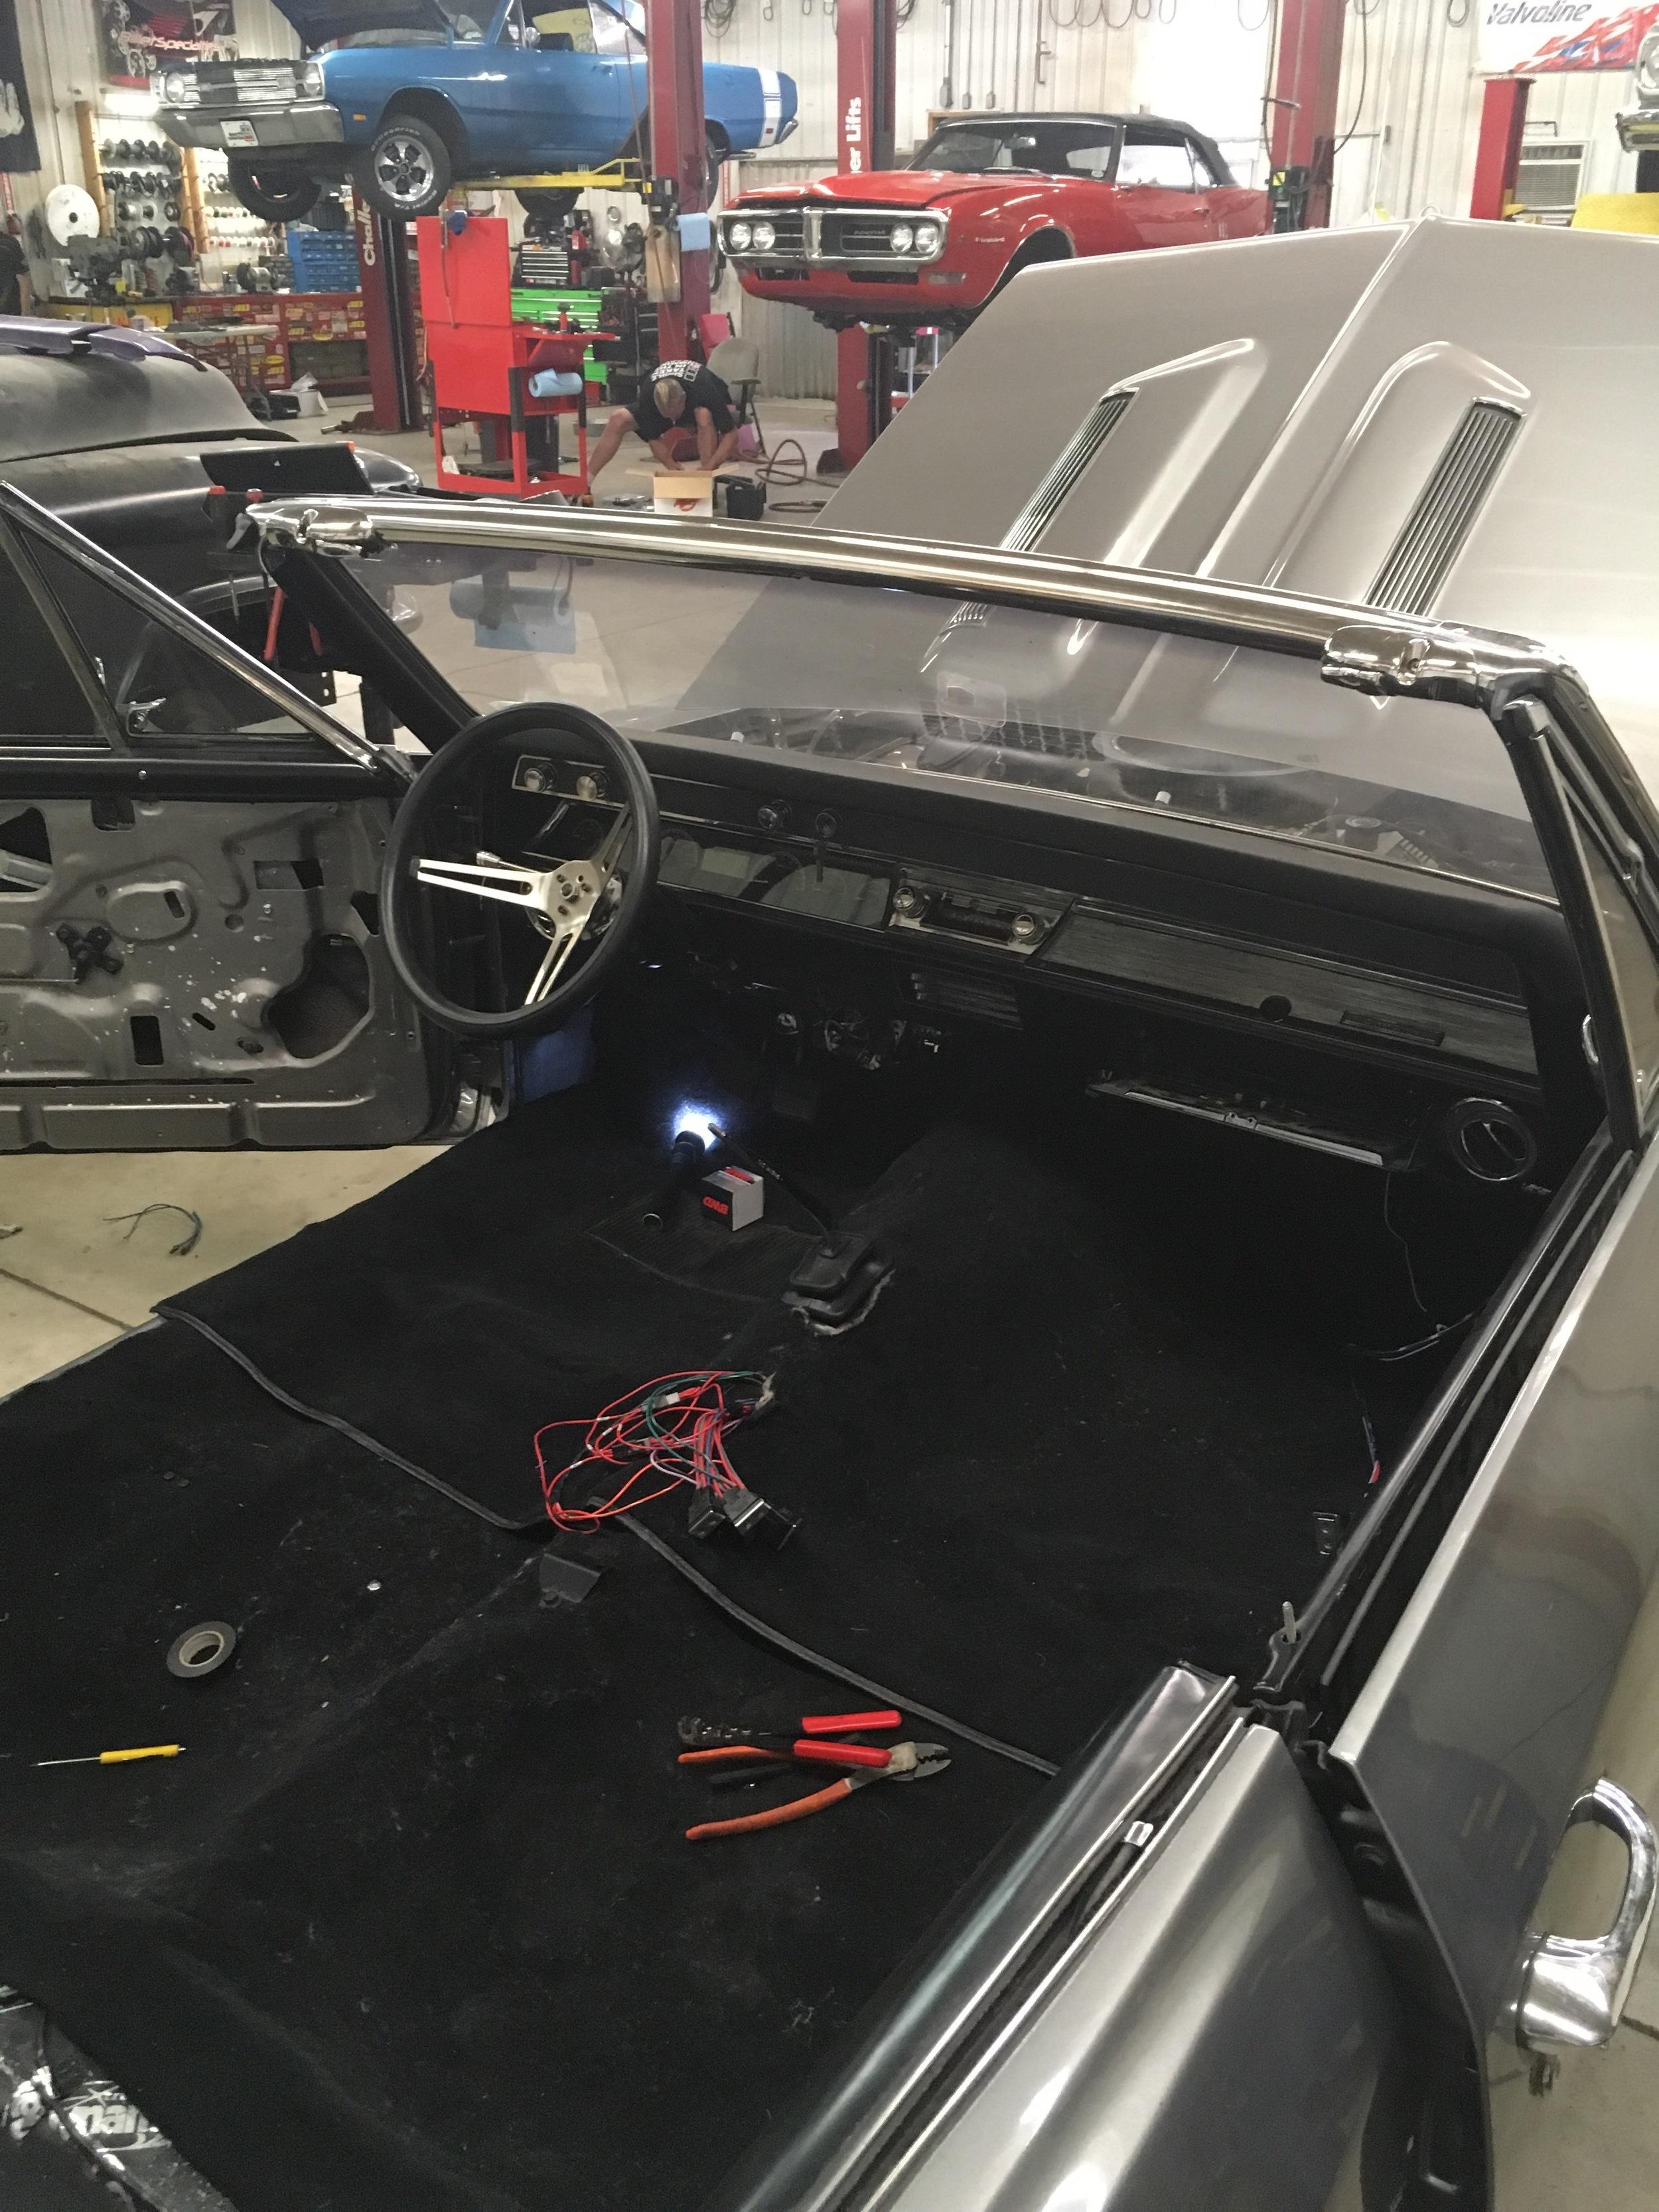 1967-chevelle-ss-minneapolis-hot-rod-custom-car-restoration-6.jpg